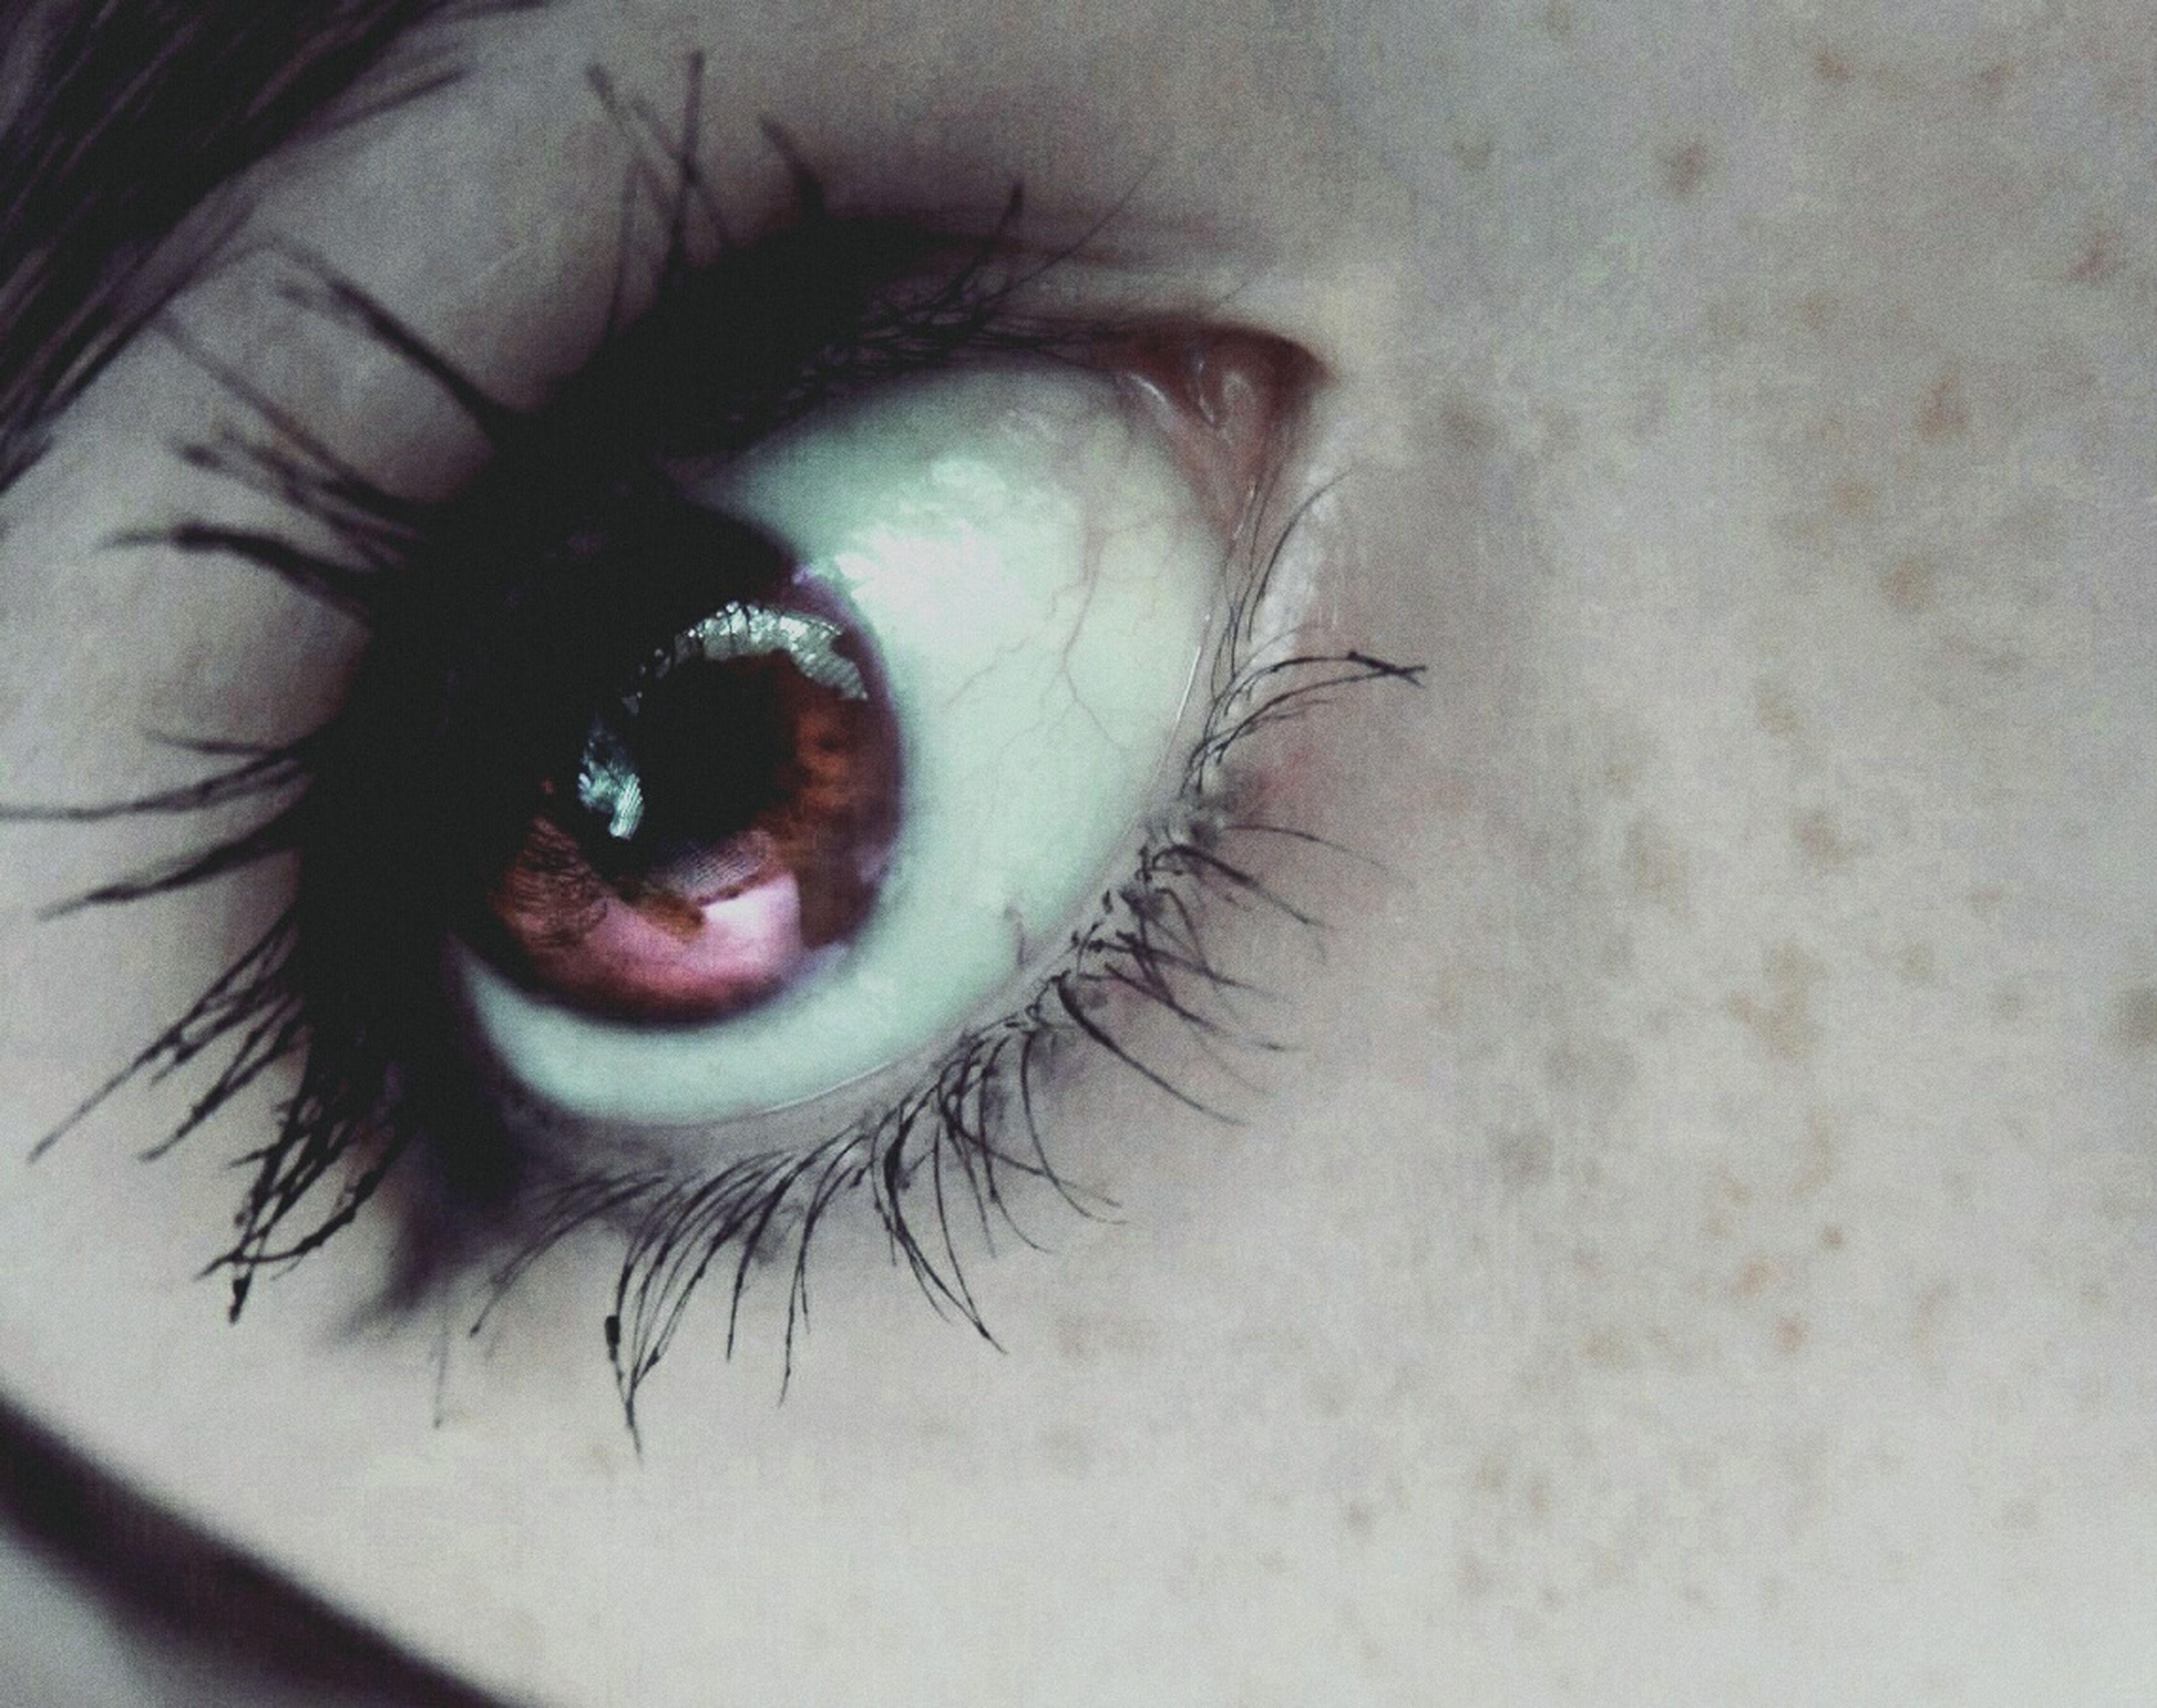 close-up, human eye, part of, eyelash, sensory perception, eyesight, unrecognizable person, eyeball, extreme close-up, portrait, extreme close up, human skin, cropped, lifestyles, animal body part, detail, selective focus, macro, human face, focus on foreground